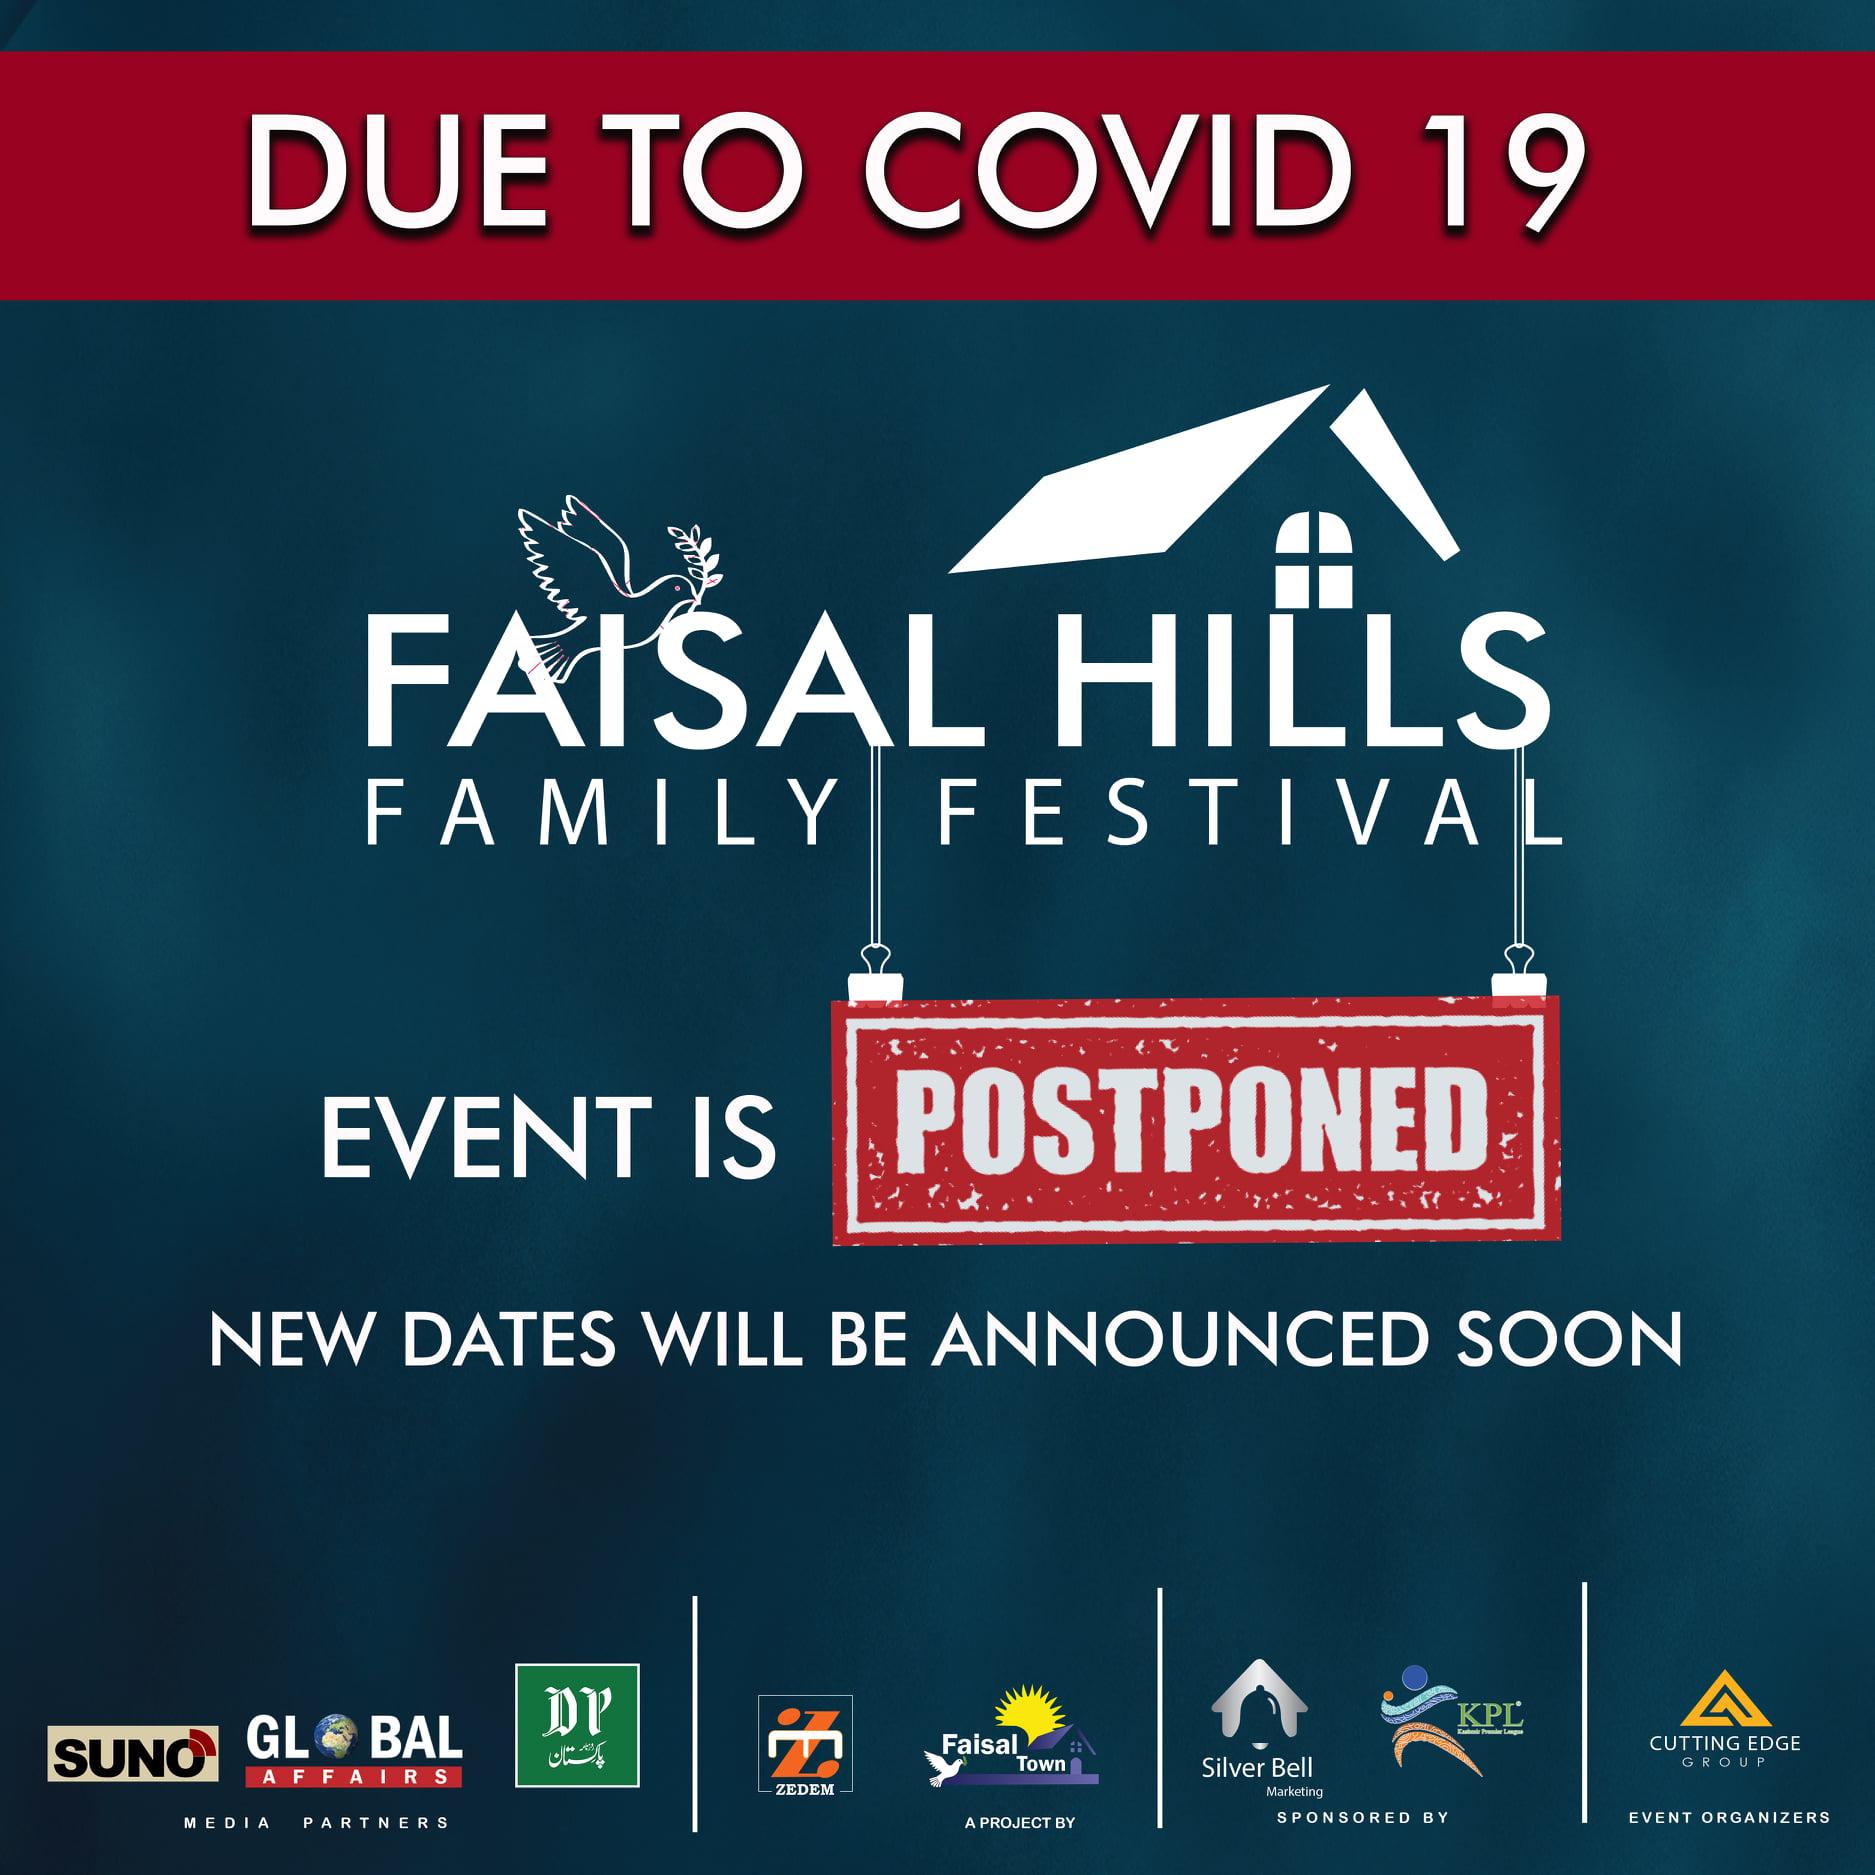 Faisal Hills Family Festival